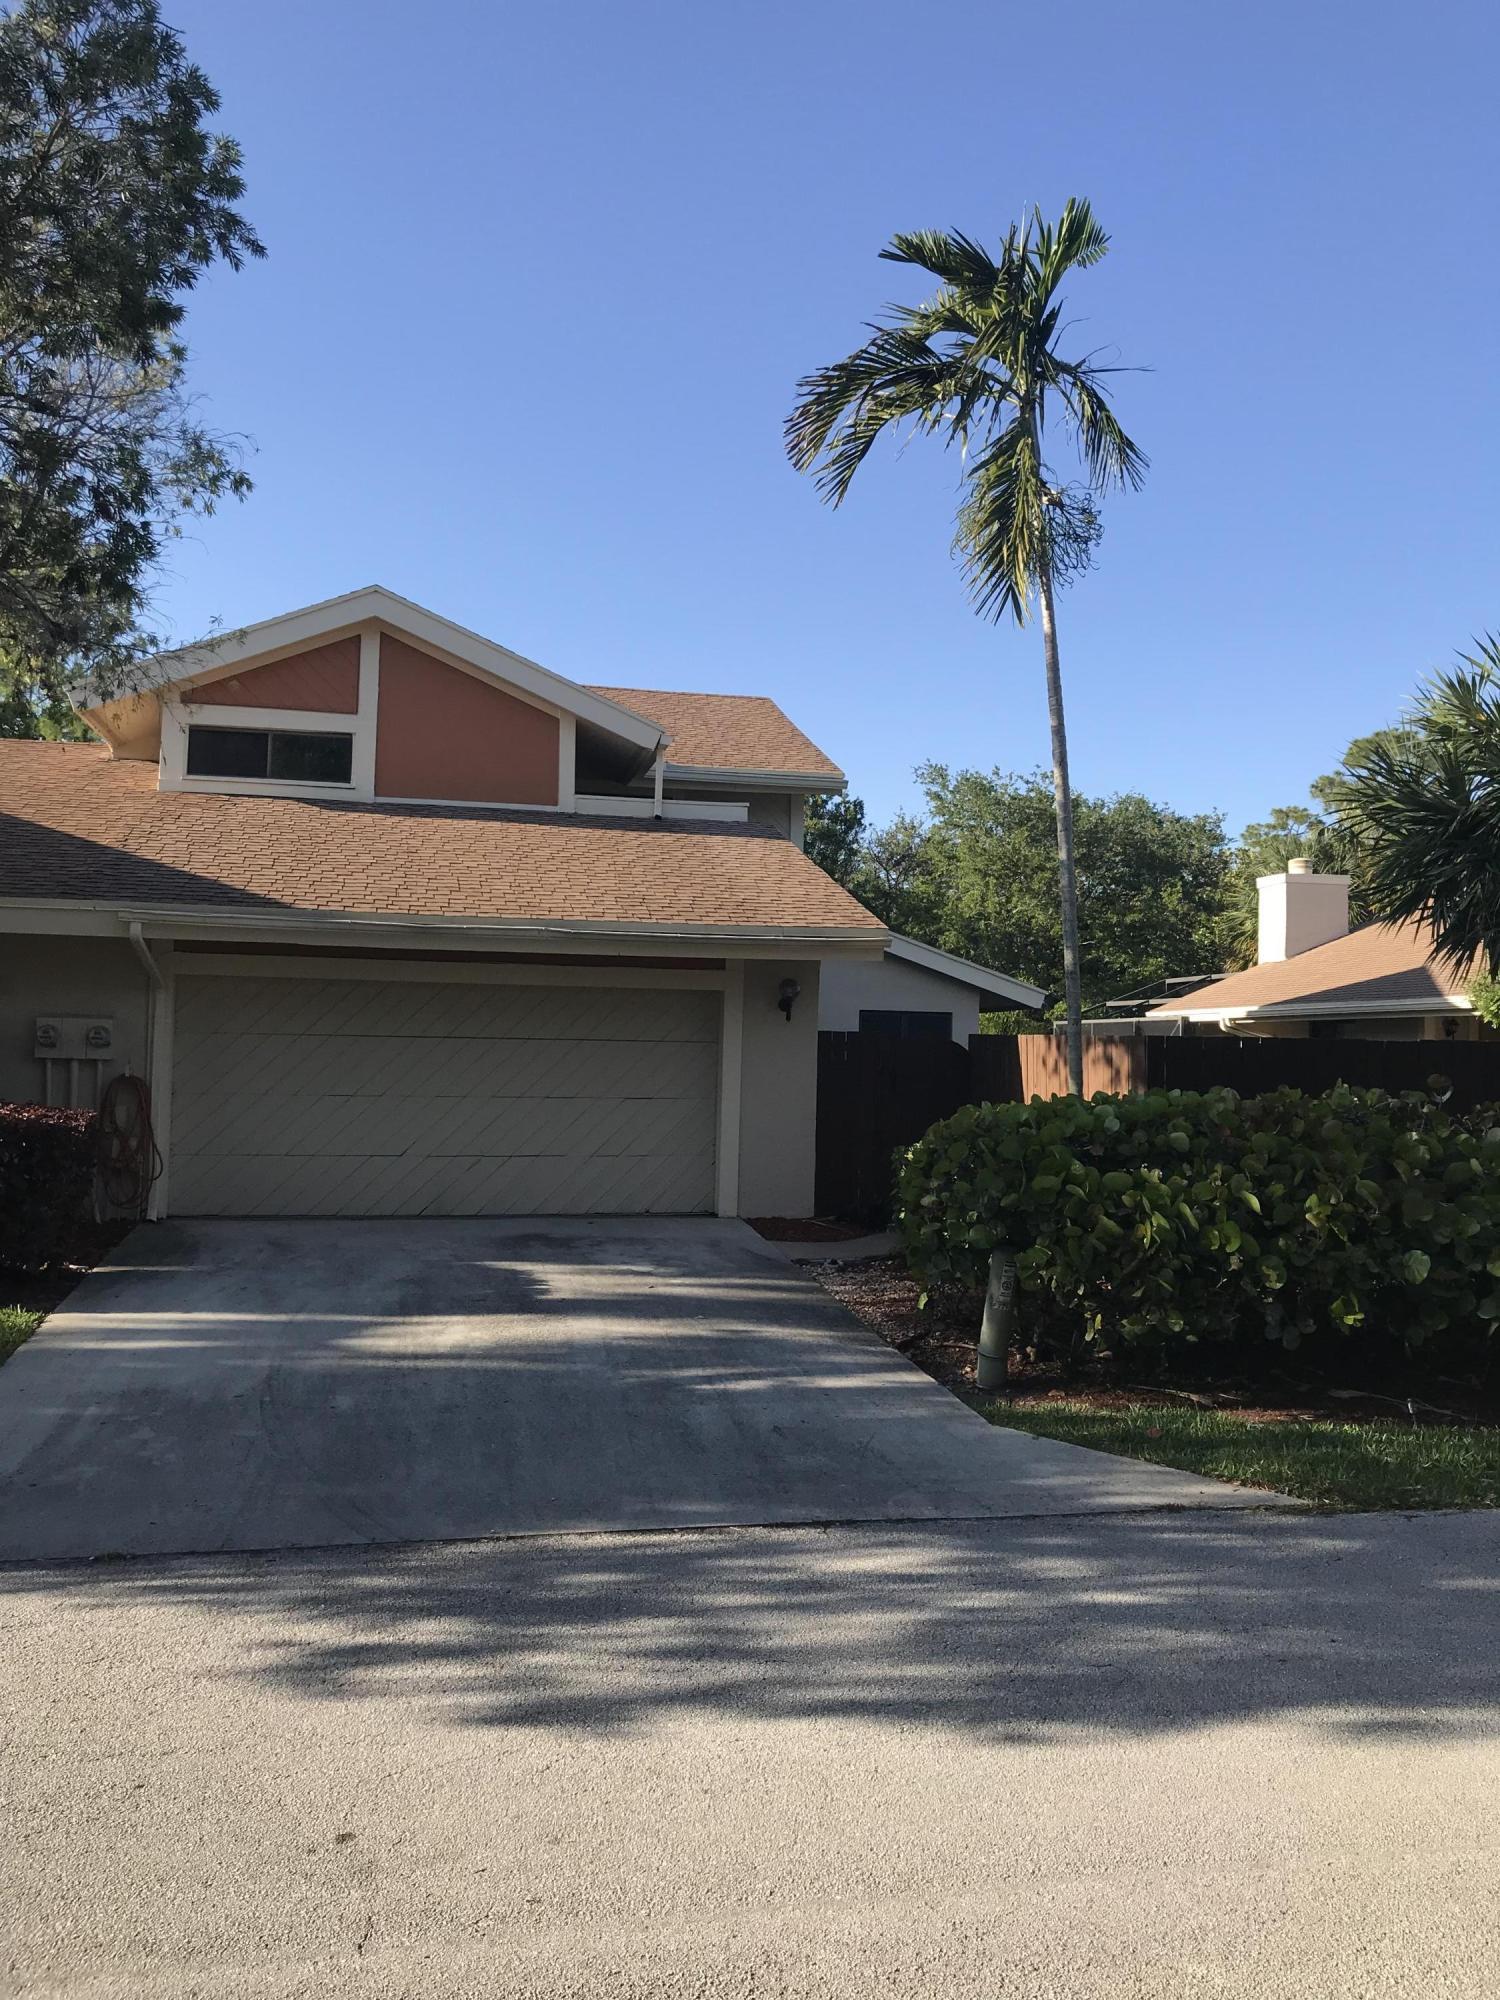 7785 Stanway Place, Boca Raton, Florida 33433, 3 Bedrooms Bedrooms, ,2.1 BathroomsBathrooms,F,Townhouse,Stanway,RX-10617015